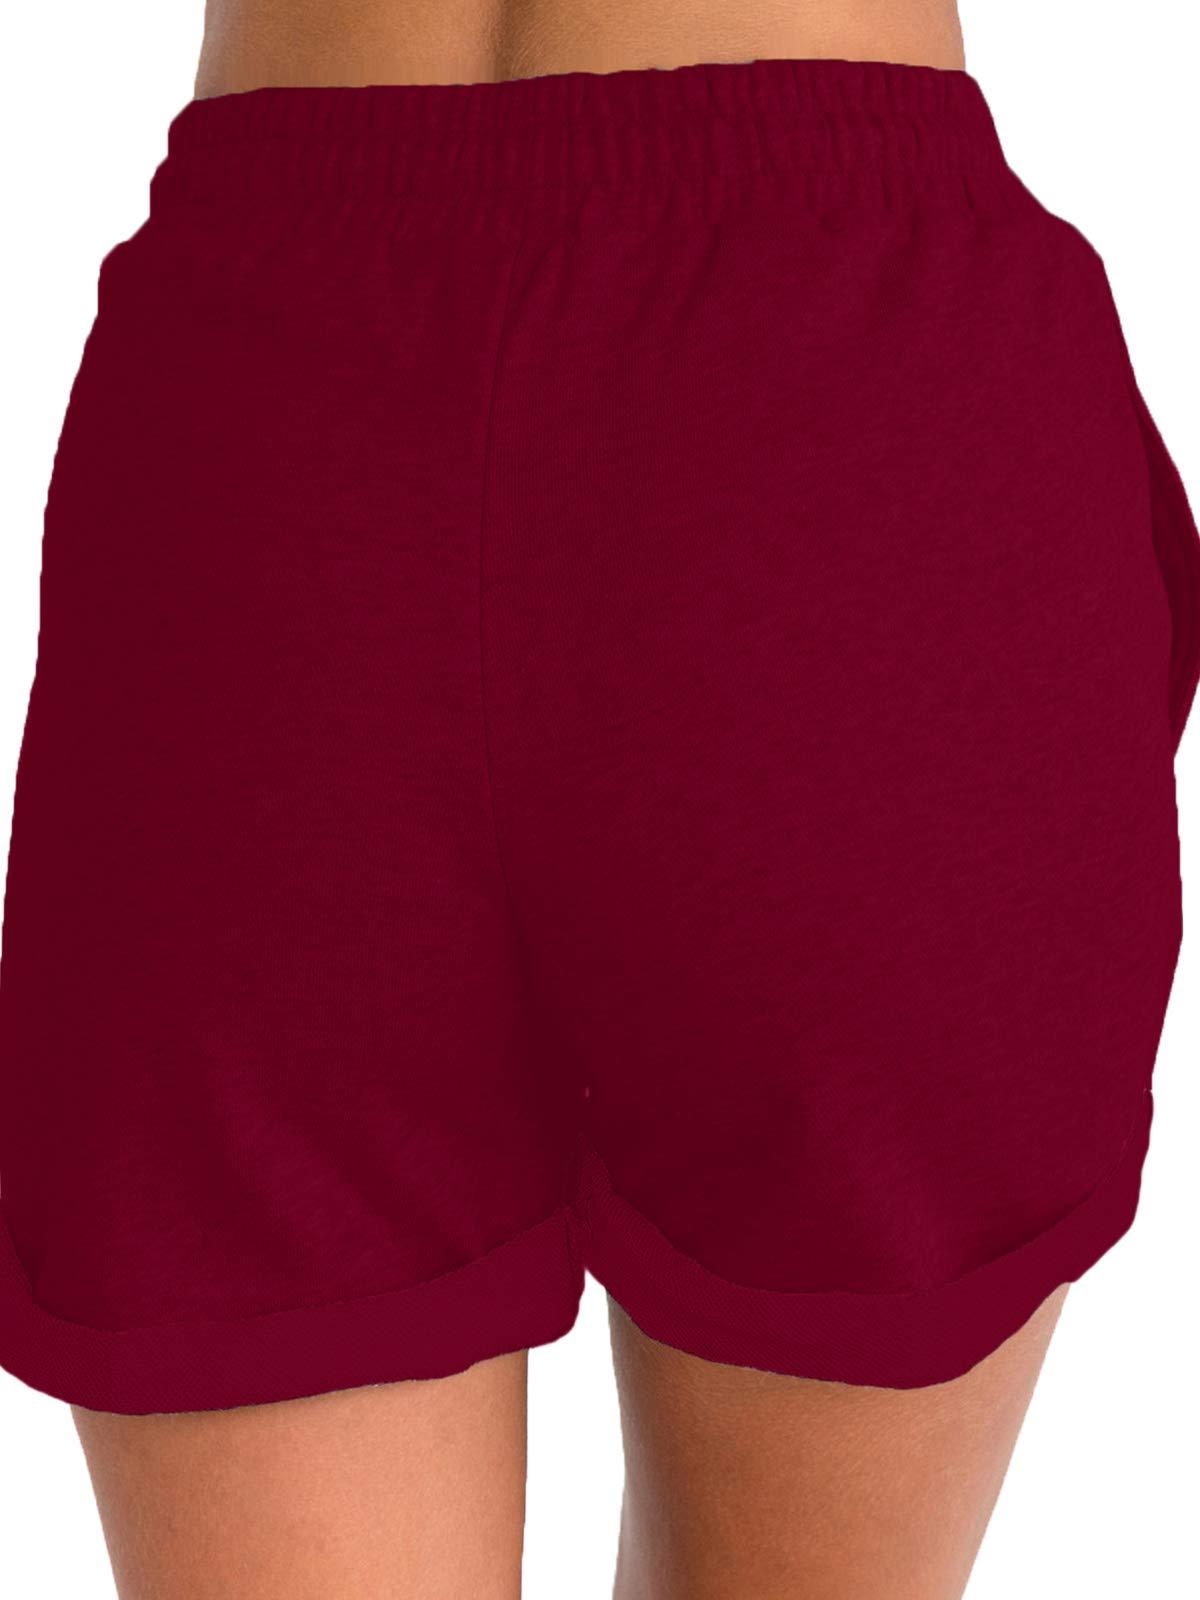 Govc Women's Juniors Shorts Casual Summer Elastic Waist Beach Shorts with Drawstring(Burgundy,S) by Govc (Image #4)